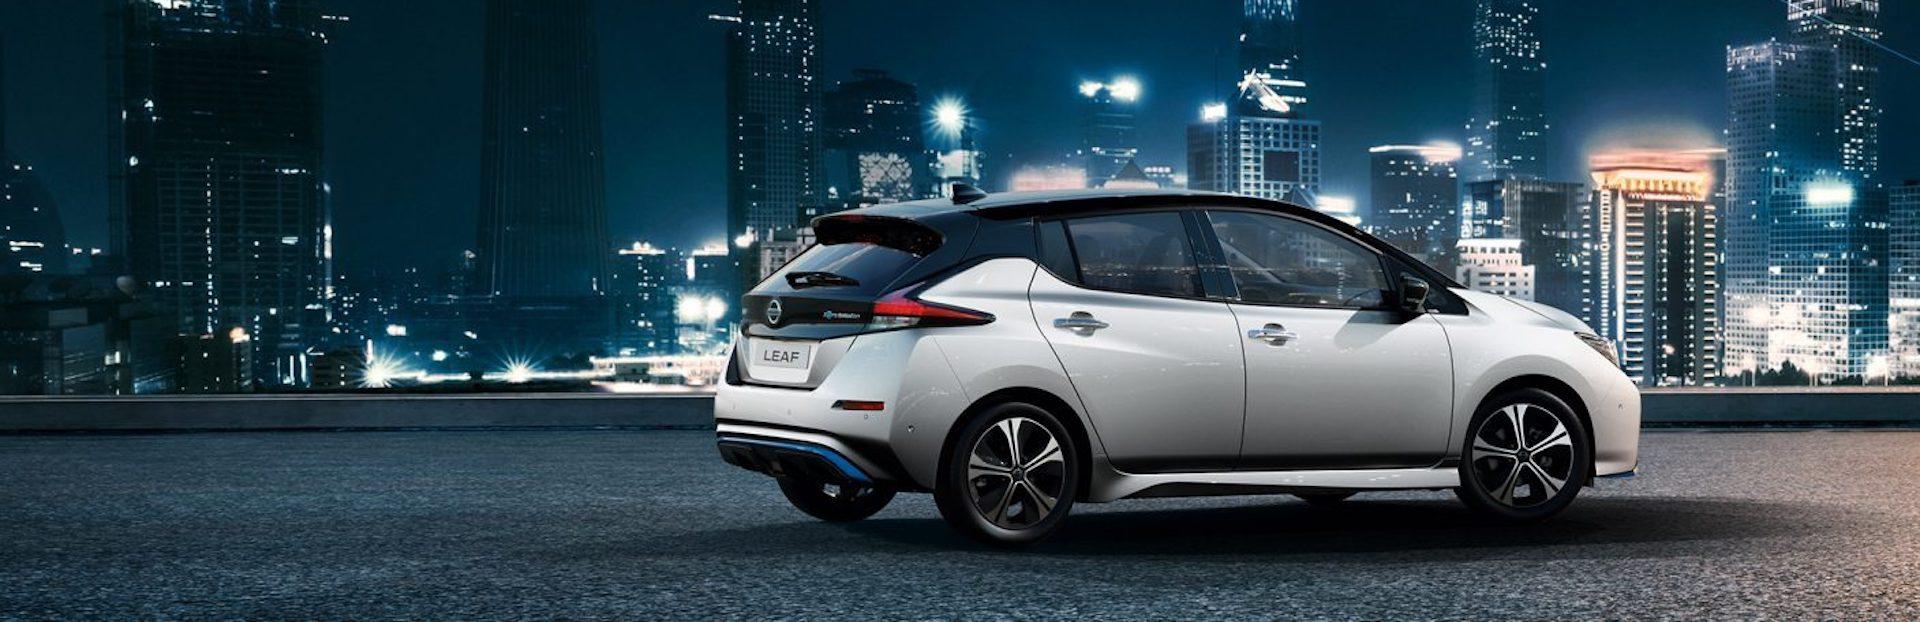 Nissan Leaf no Porto